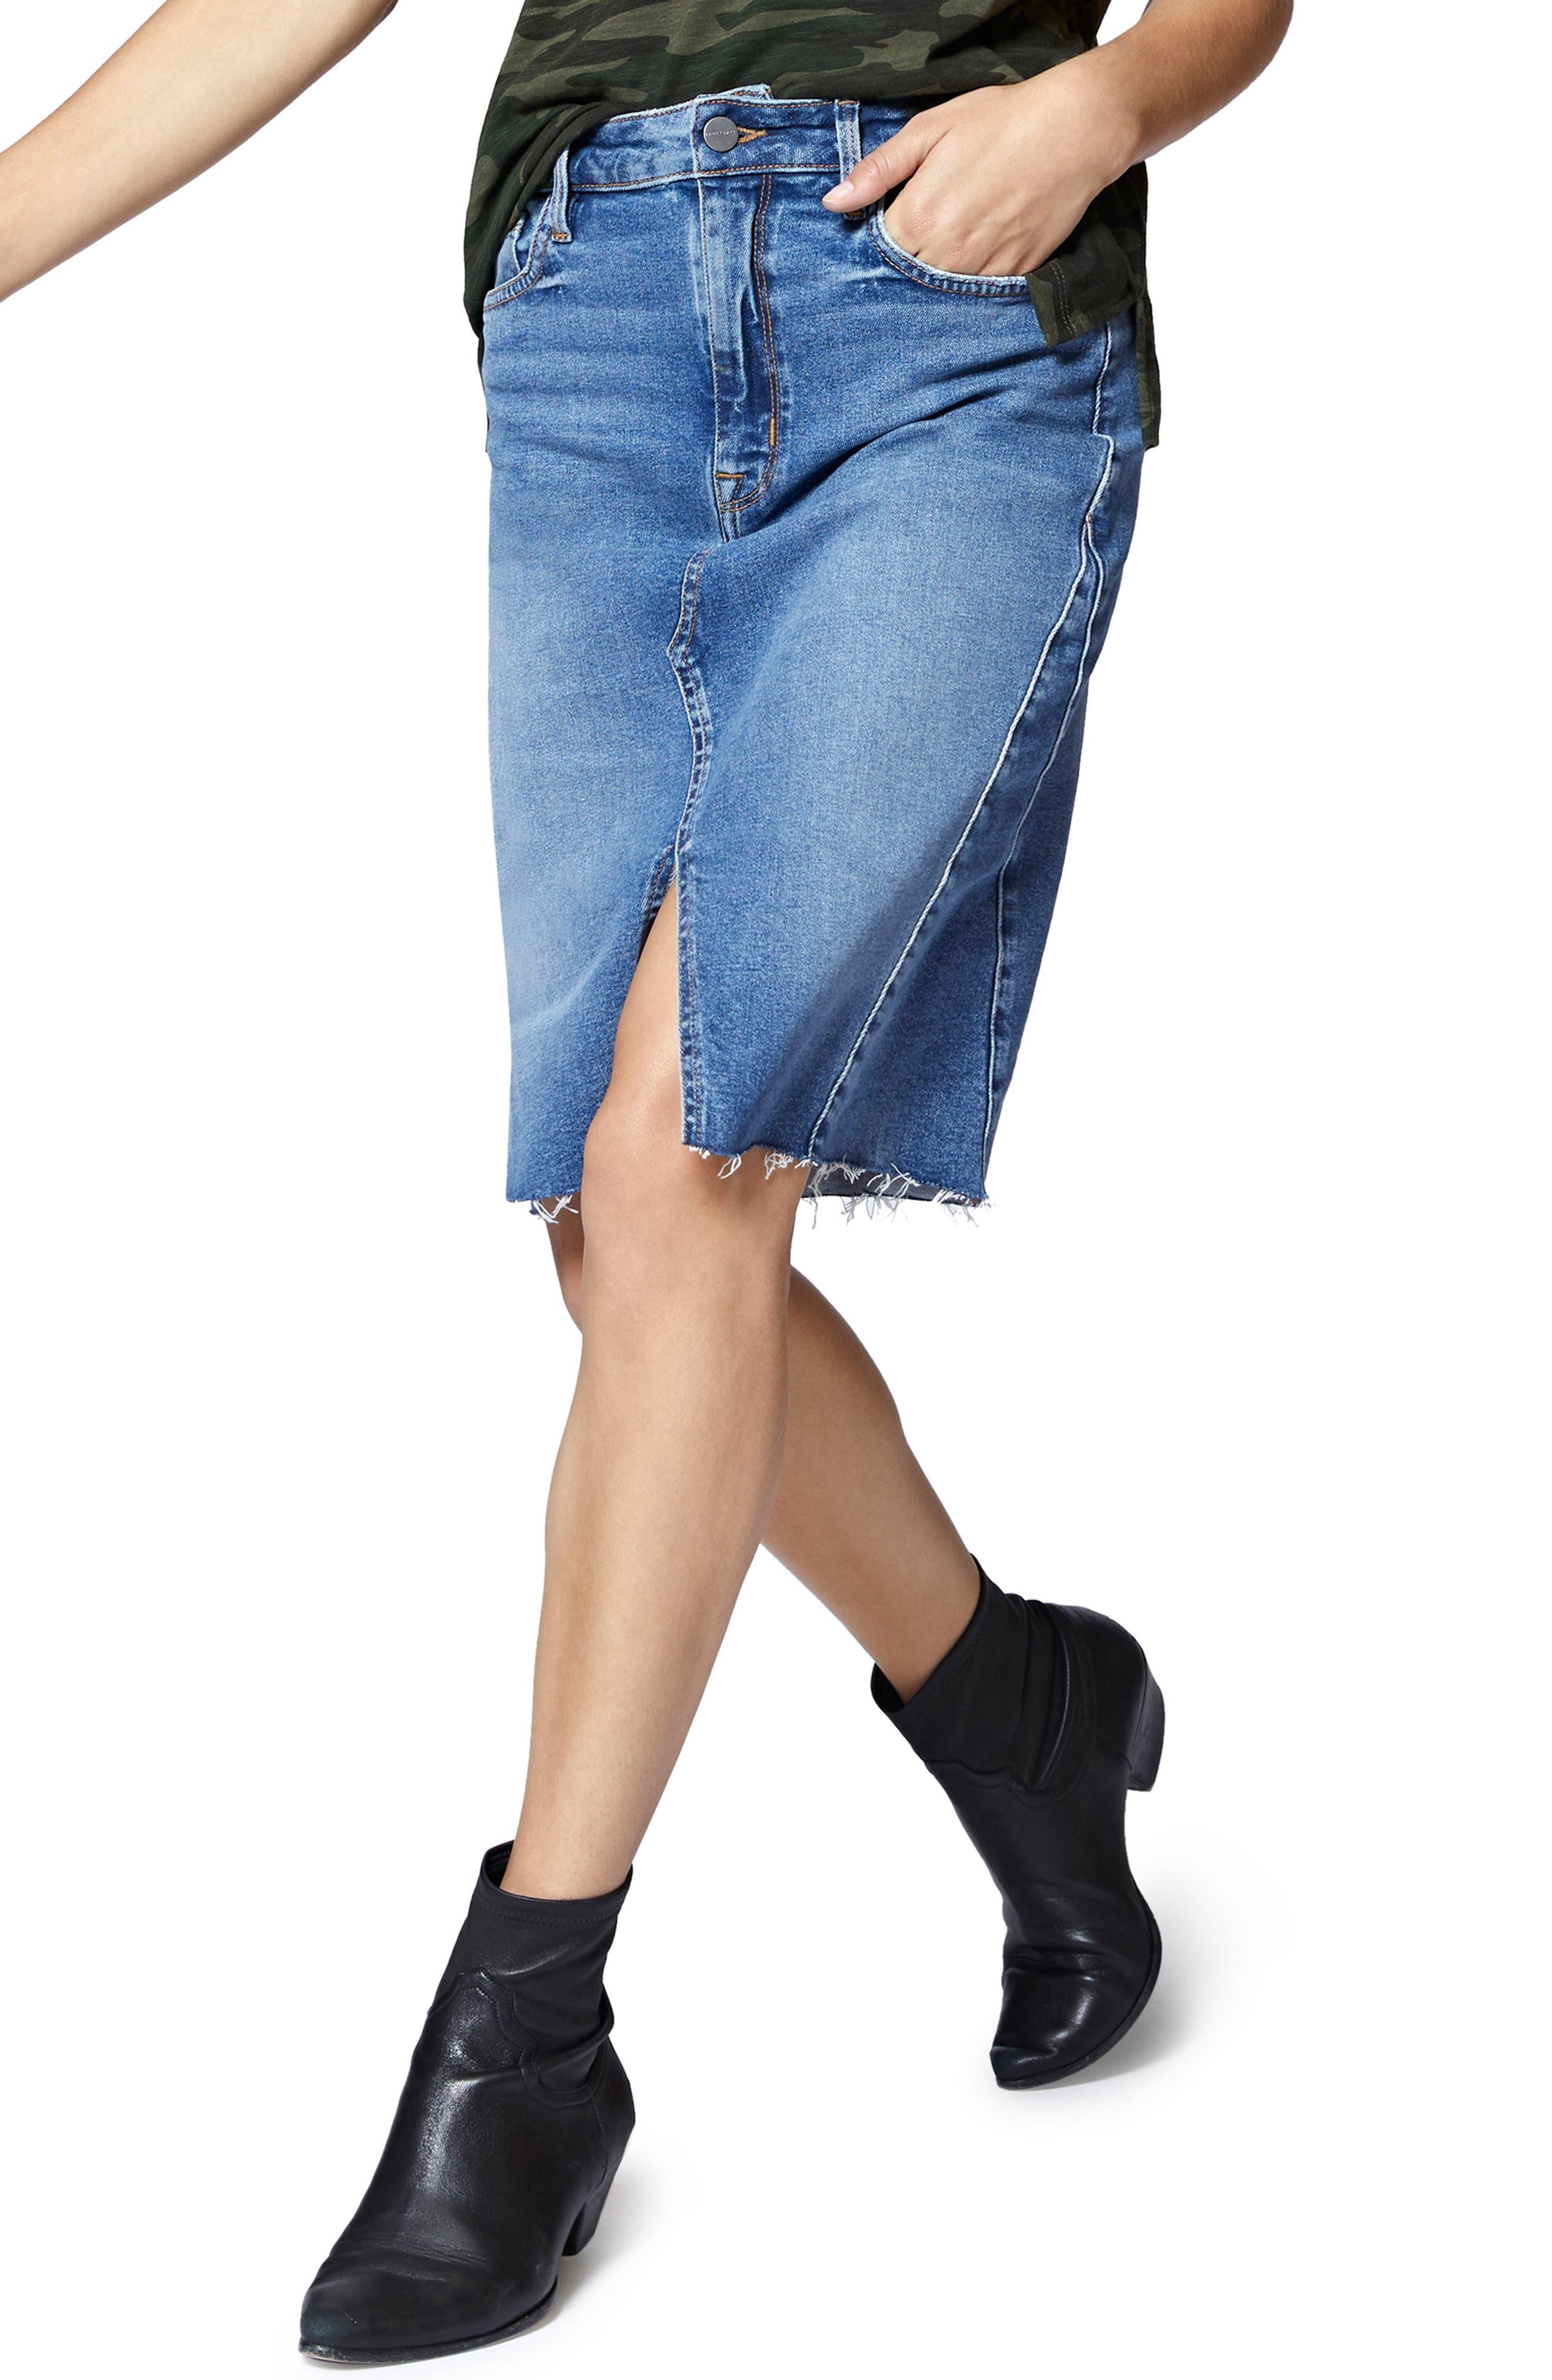 Sia A-Line Denim Skirt,                             Main thumbnail 1, color,                             FLAT IRON RIGID